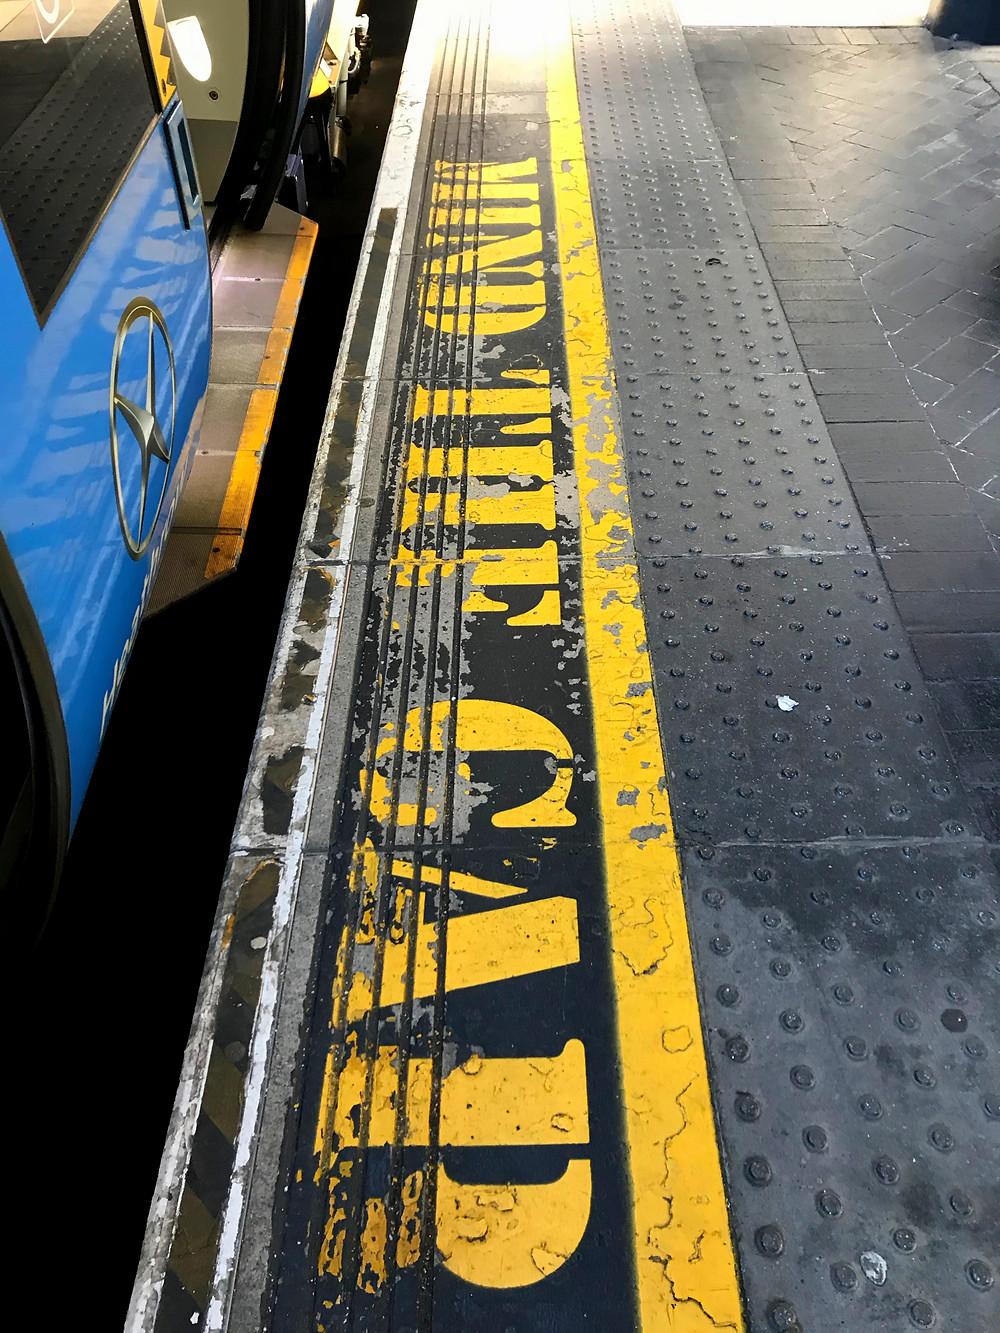 London transit